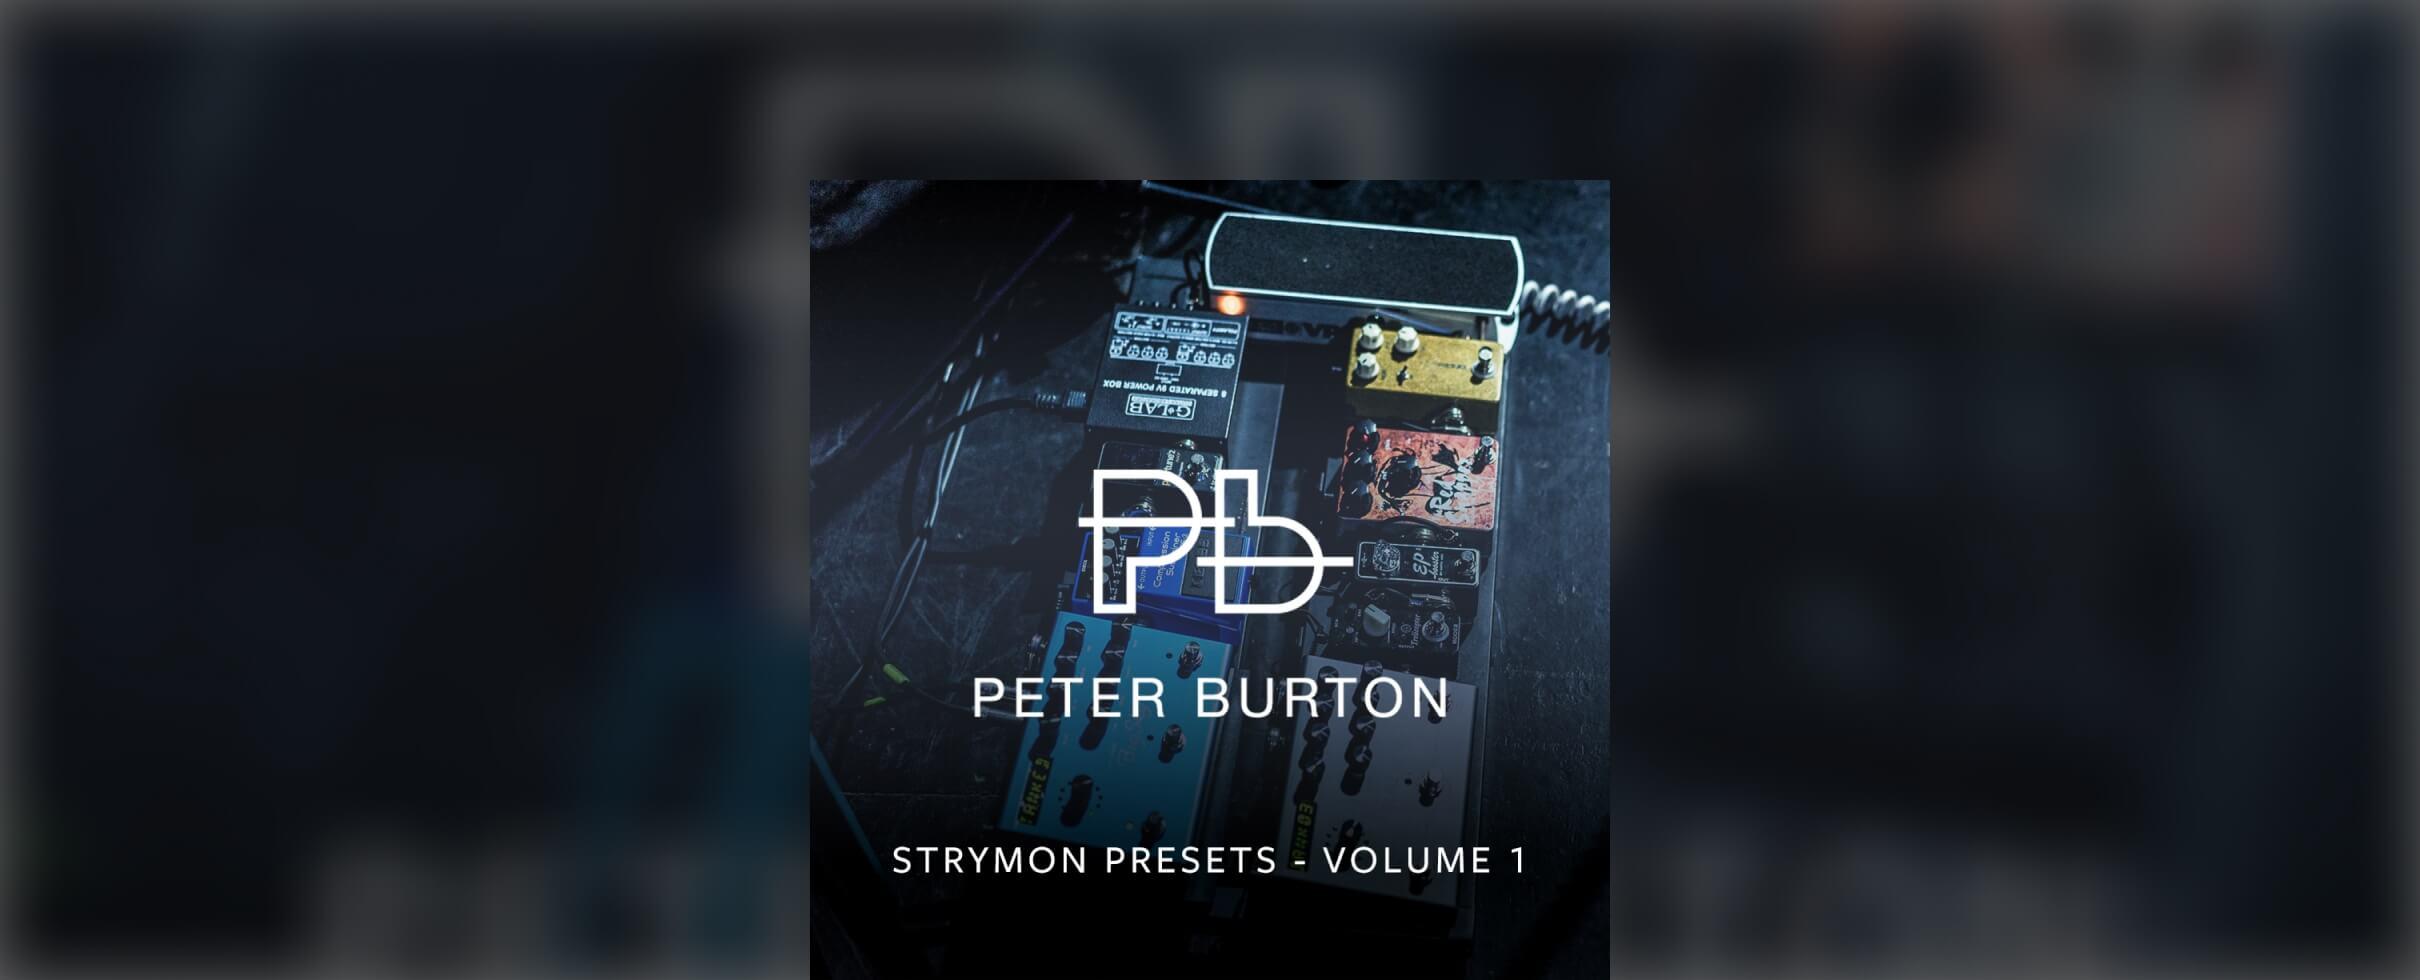 <h1>Strymon Presests Vol. 1</h1> <strong>Peter Burton</strong>